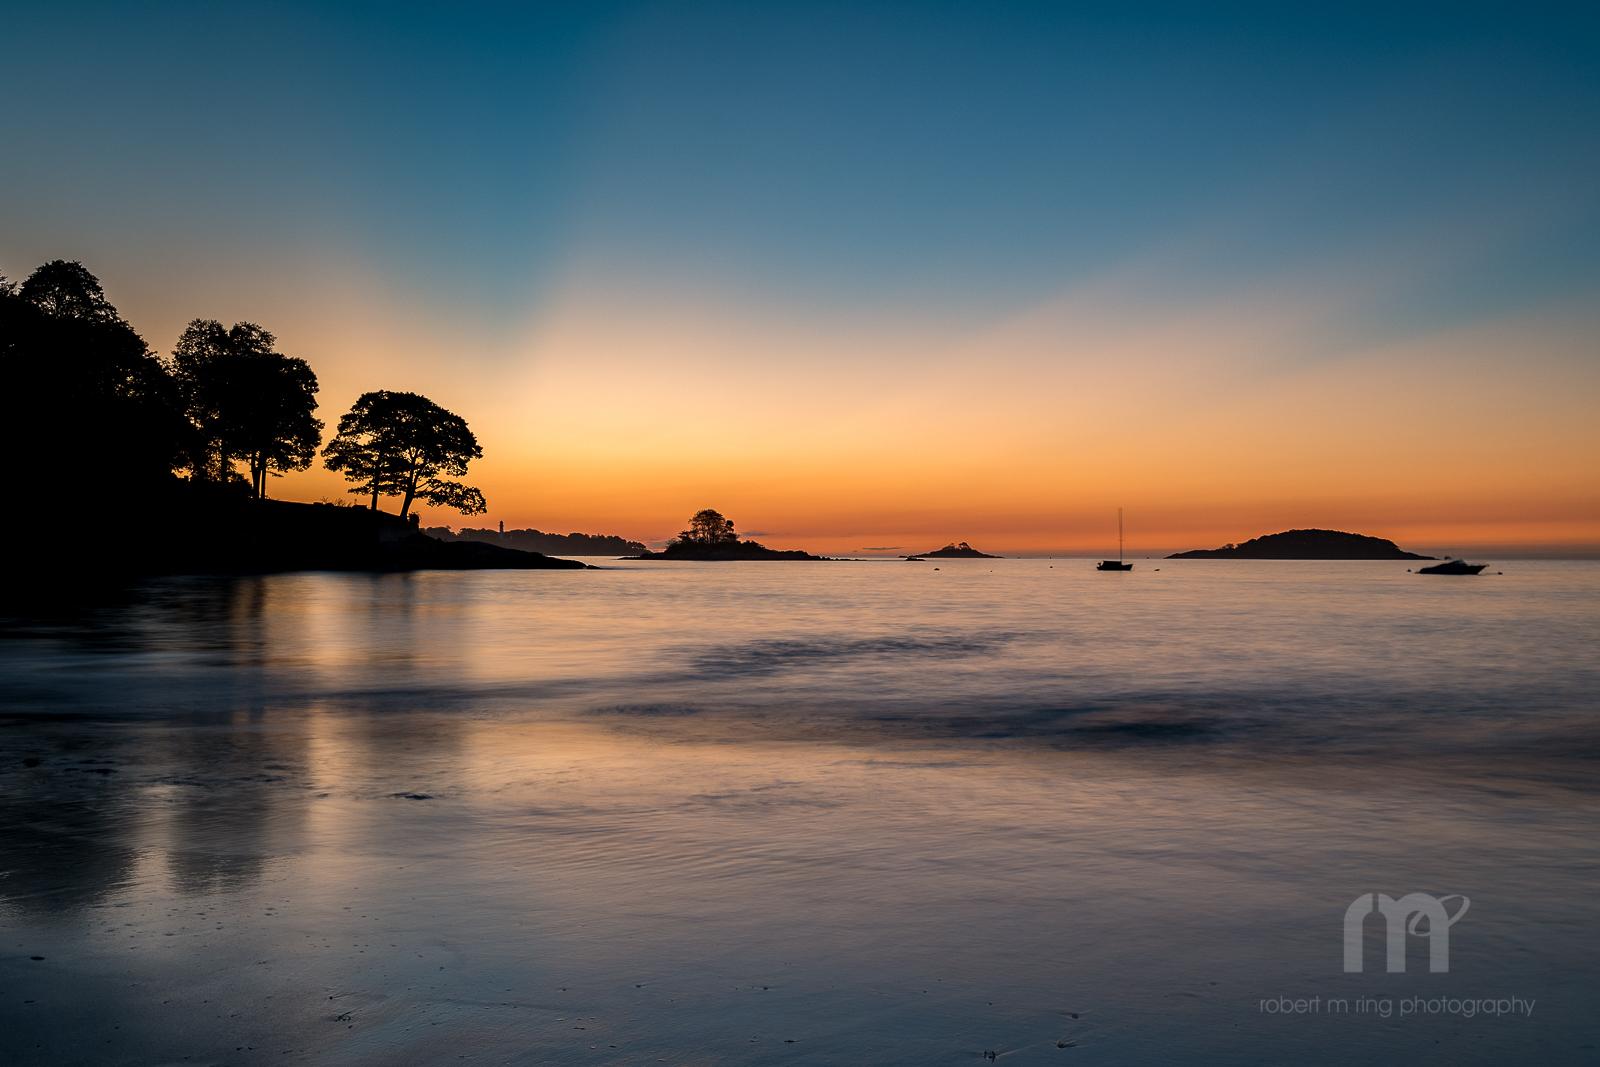 Sunrise, Beverly, MA, Massachusetts, New England, scenic, scenic, long exposure, photo